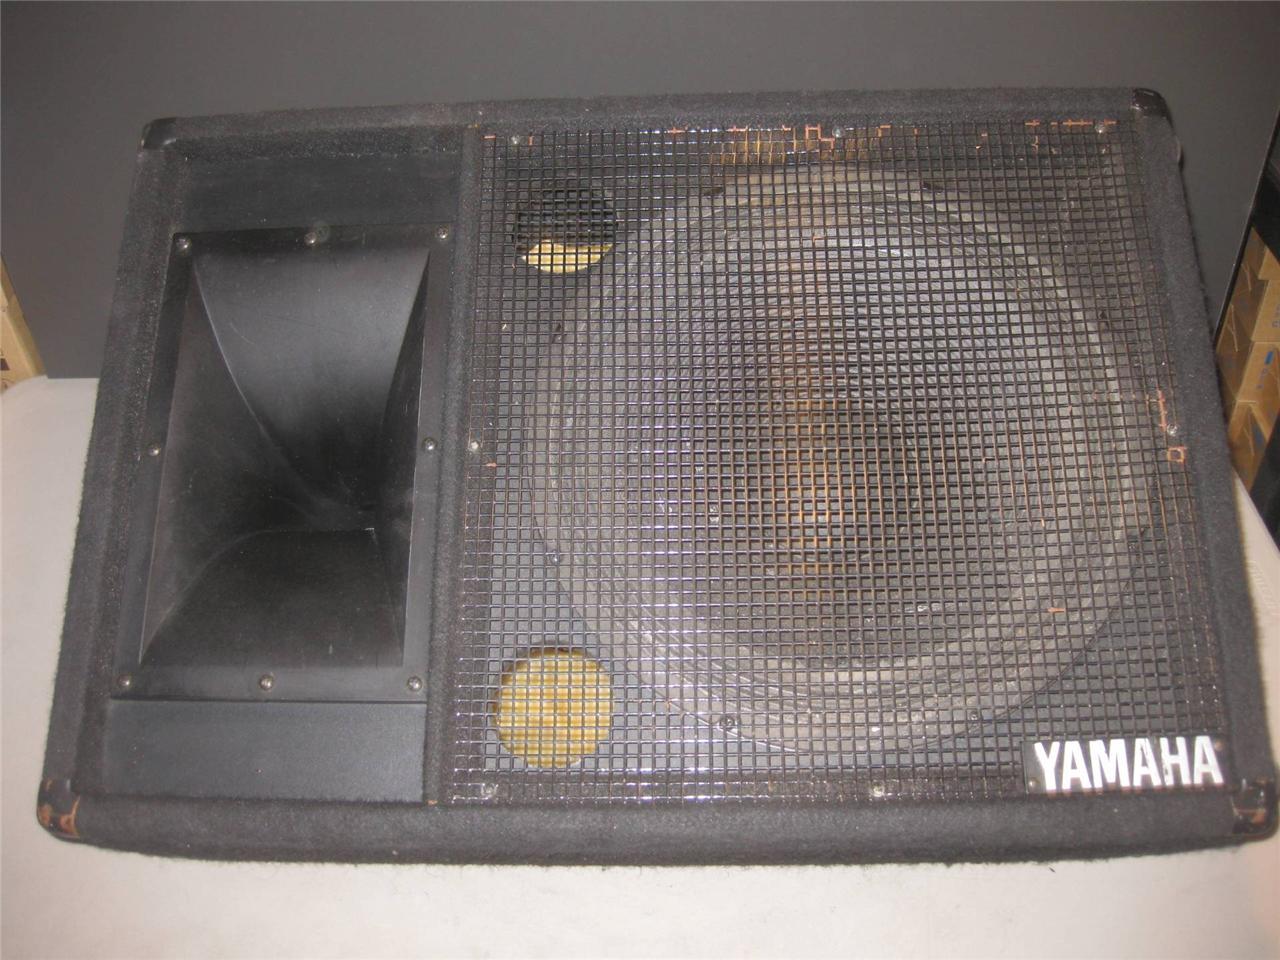 Yamaha club series iii floor monitor sm15111 unpowered for Yamaha stage monitors